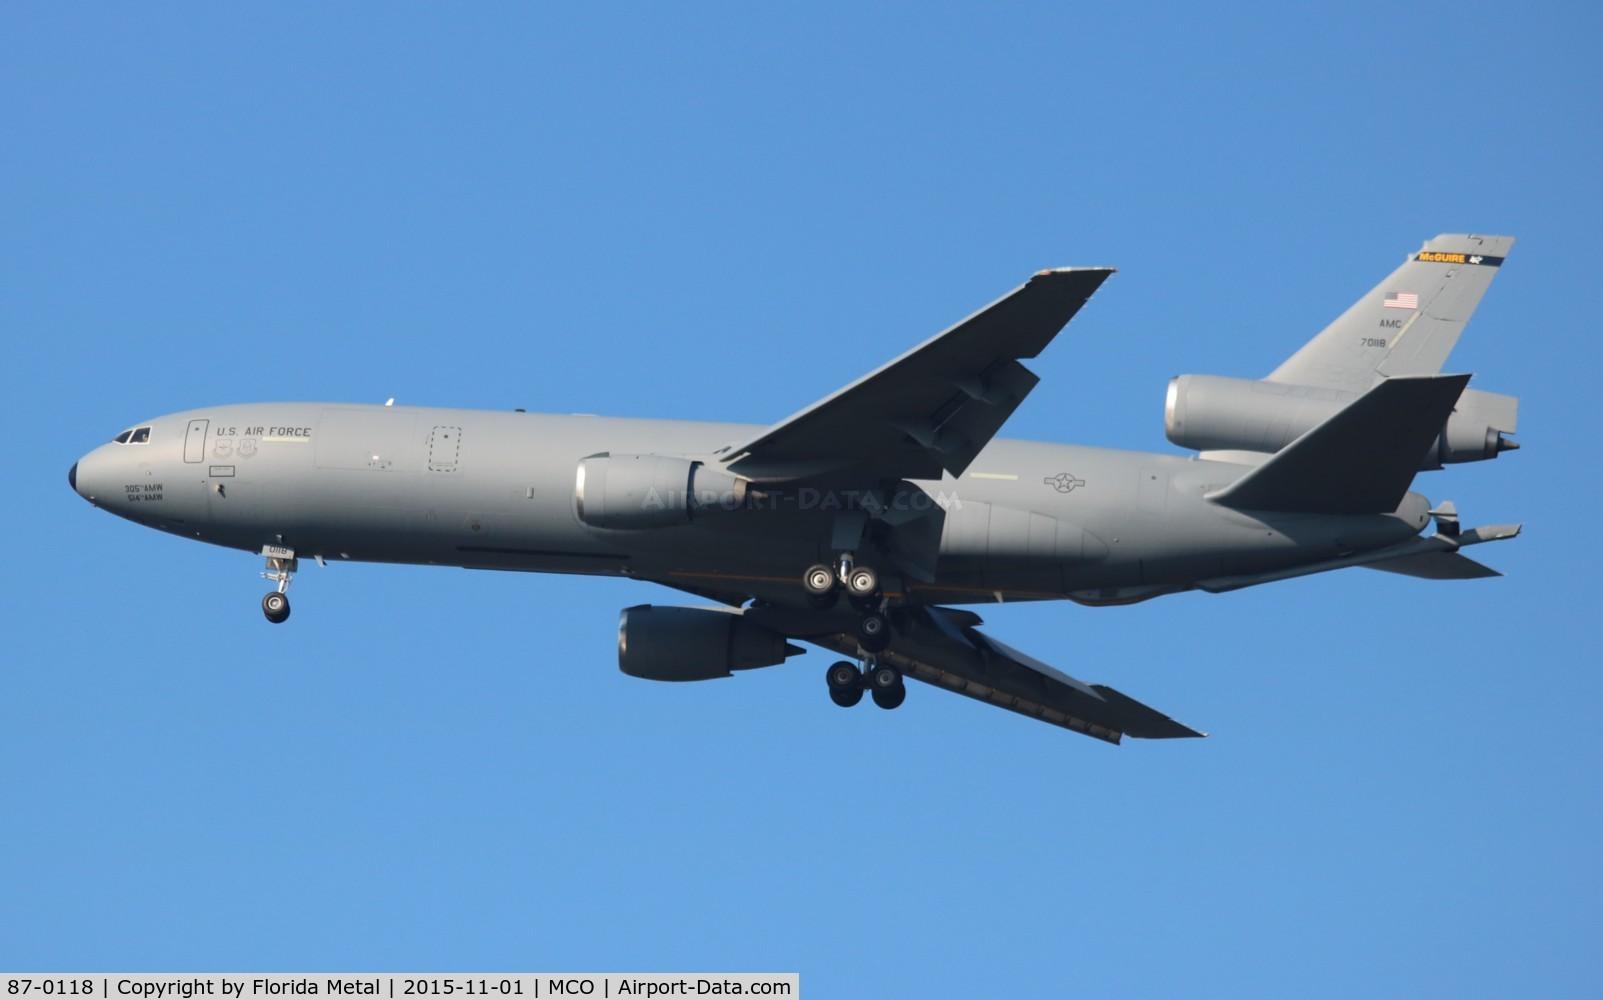 87-0118, 1987 McDonnell Douglas KC-10A Extender C/N 48304, KC-10A